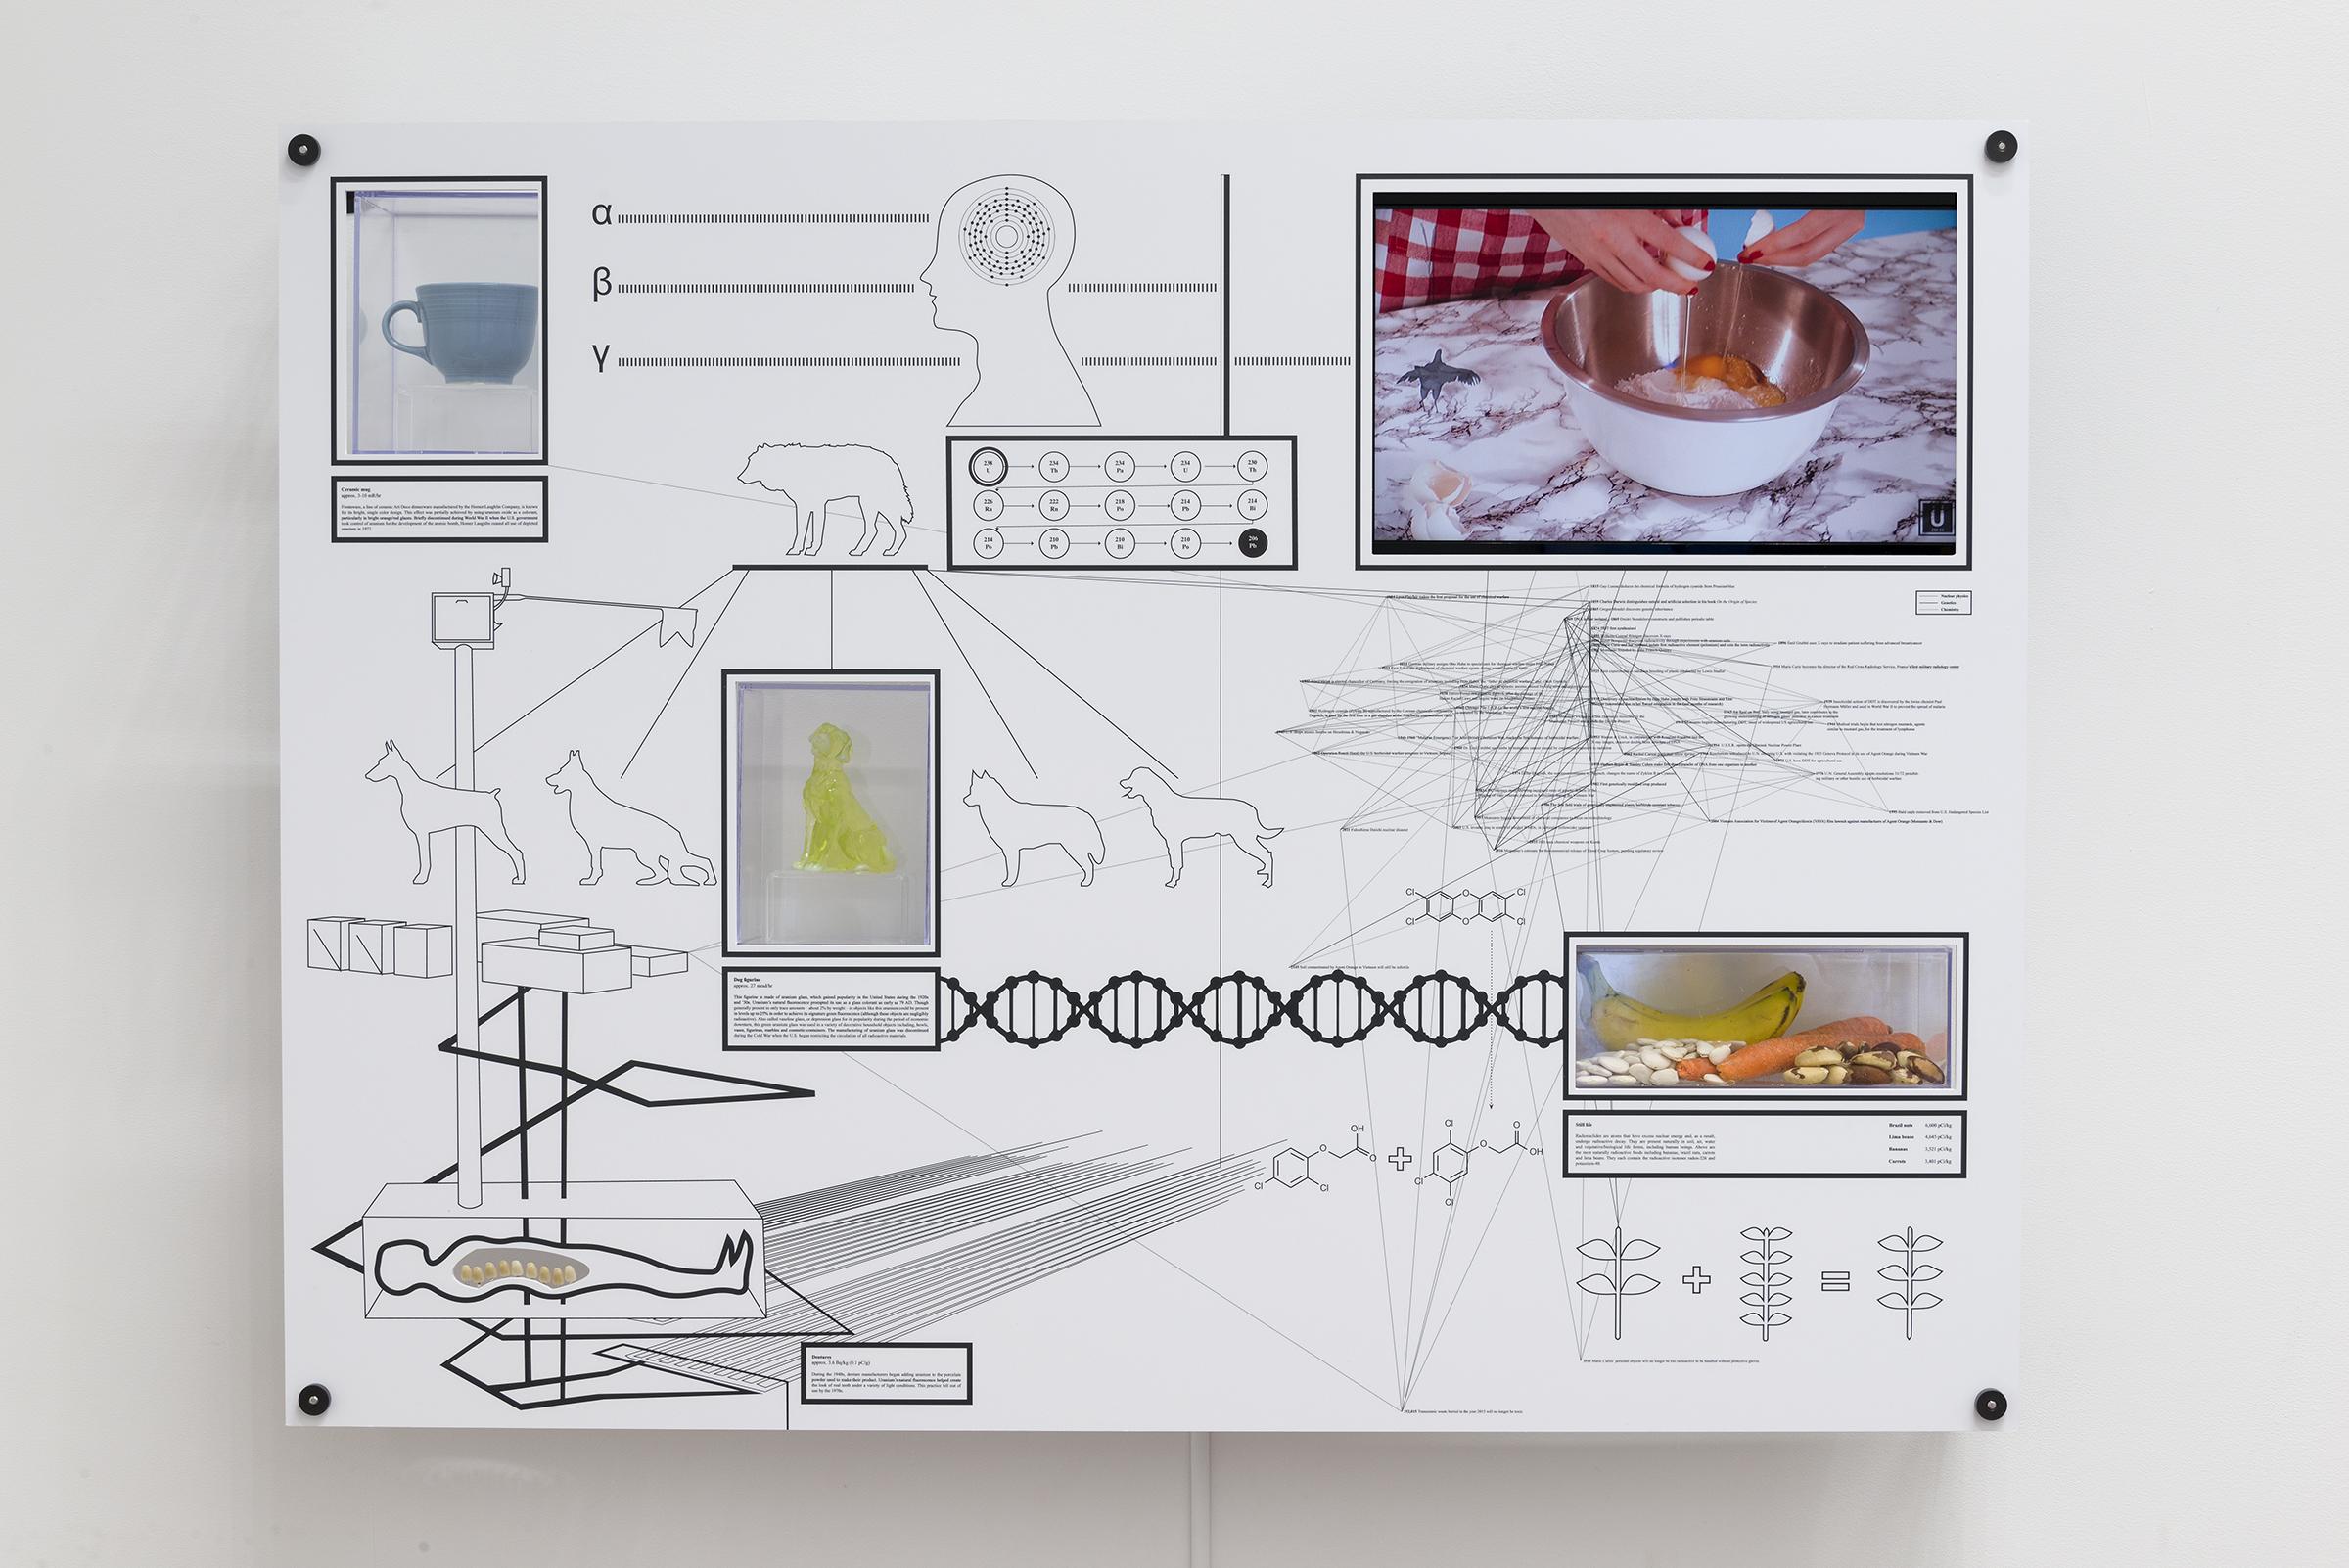 Encyclopedia Inc., Display Unit, U-238, 2015,digitally-printed Sintra PVC,Yellowcake (digital video, Edition 1/2) , ceramic mug, glass figurine, dentures, still life (bananas, brazil nuts, carrots, lima beans),36 x 48 x 6 in